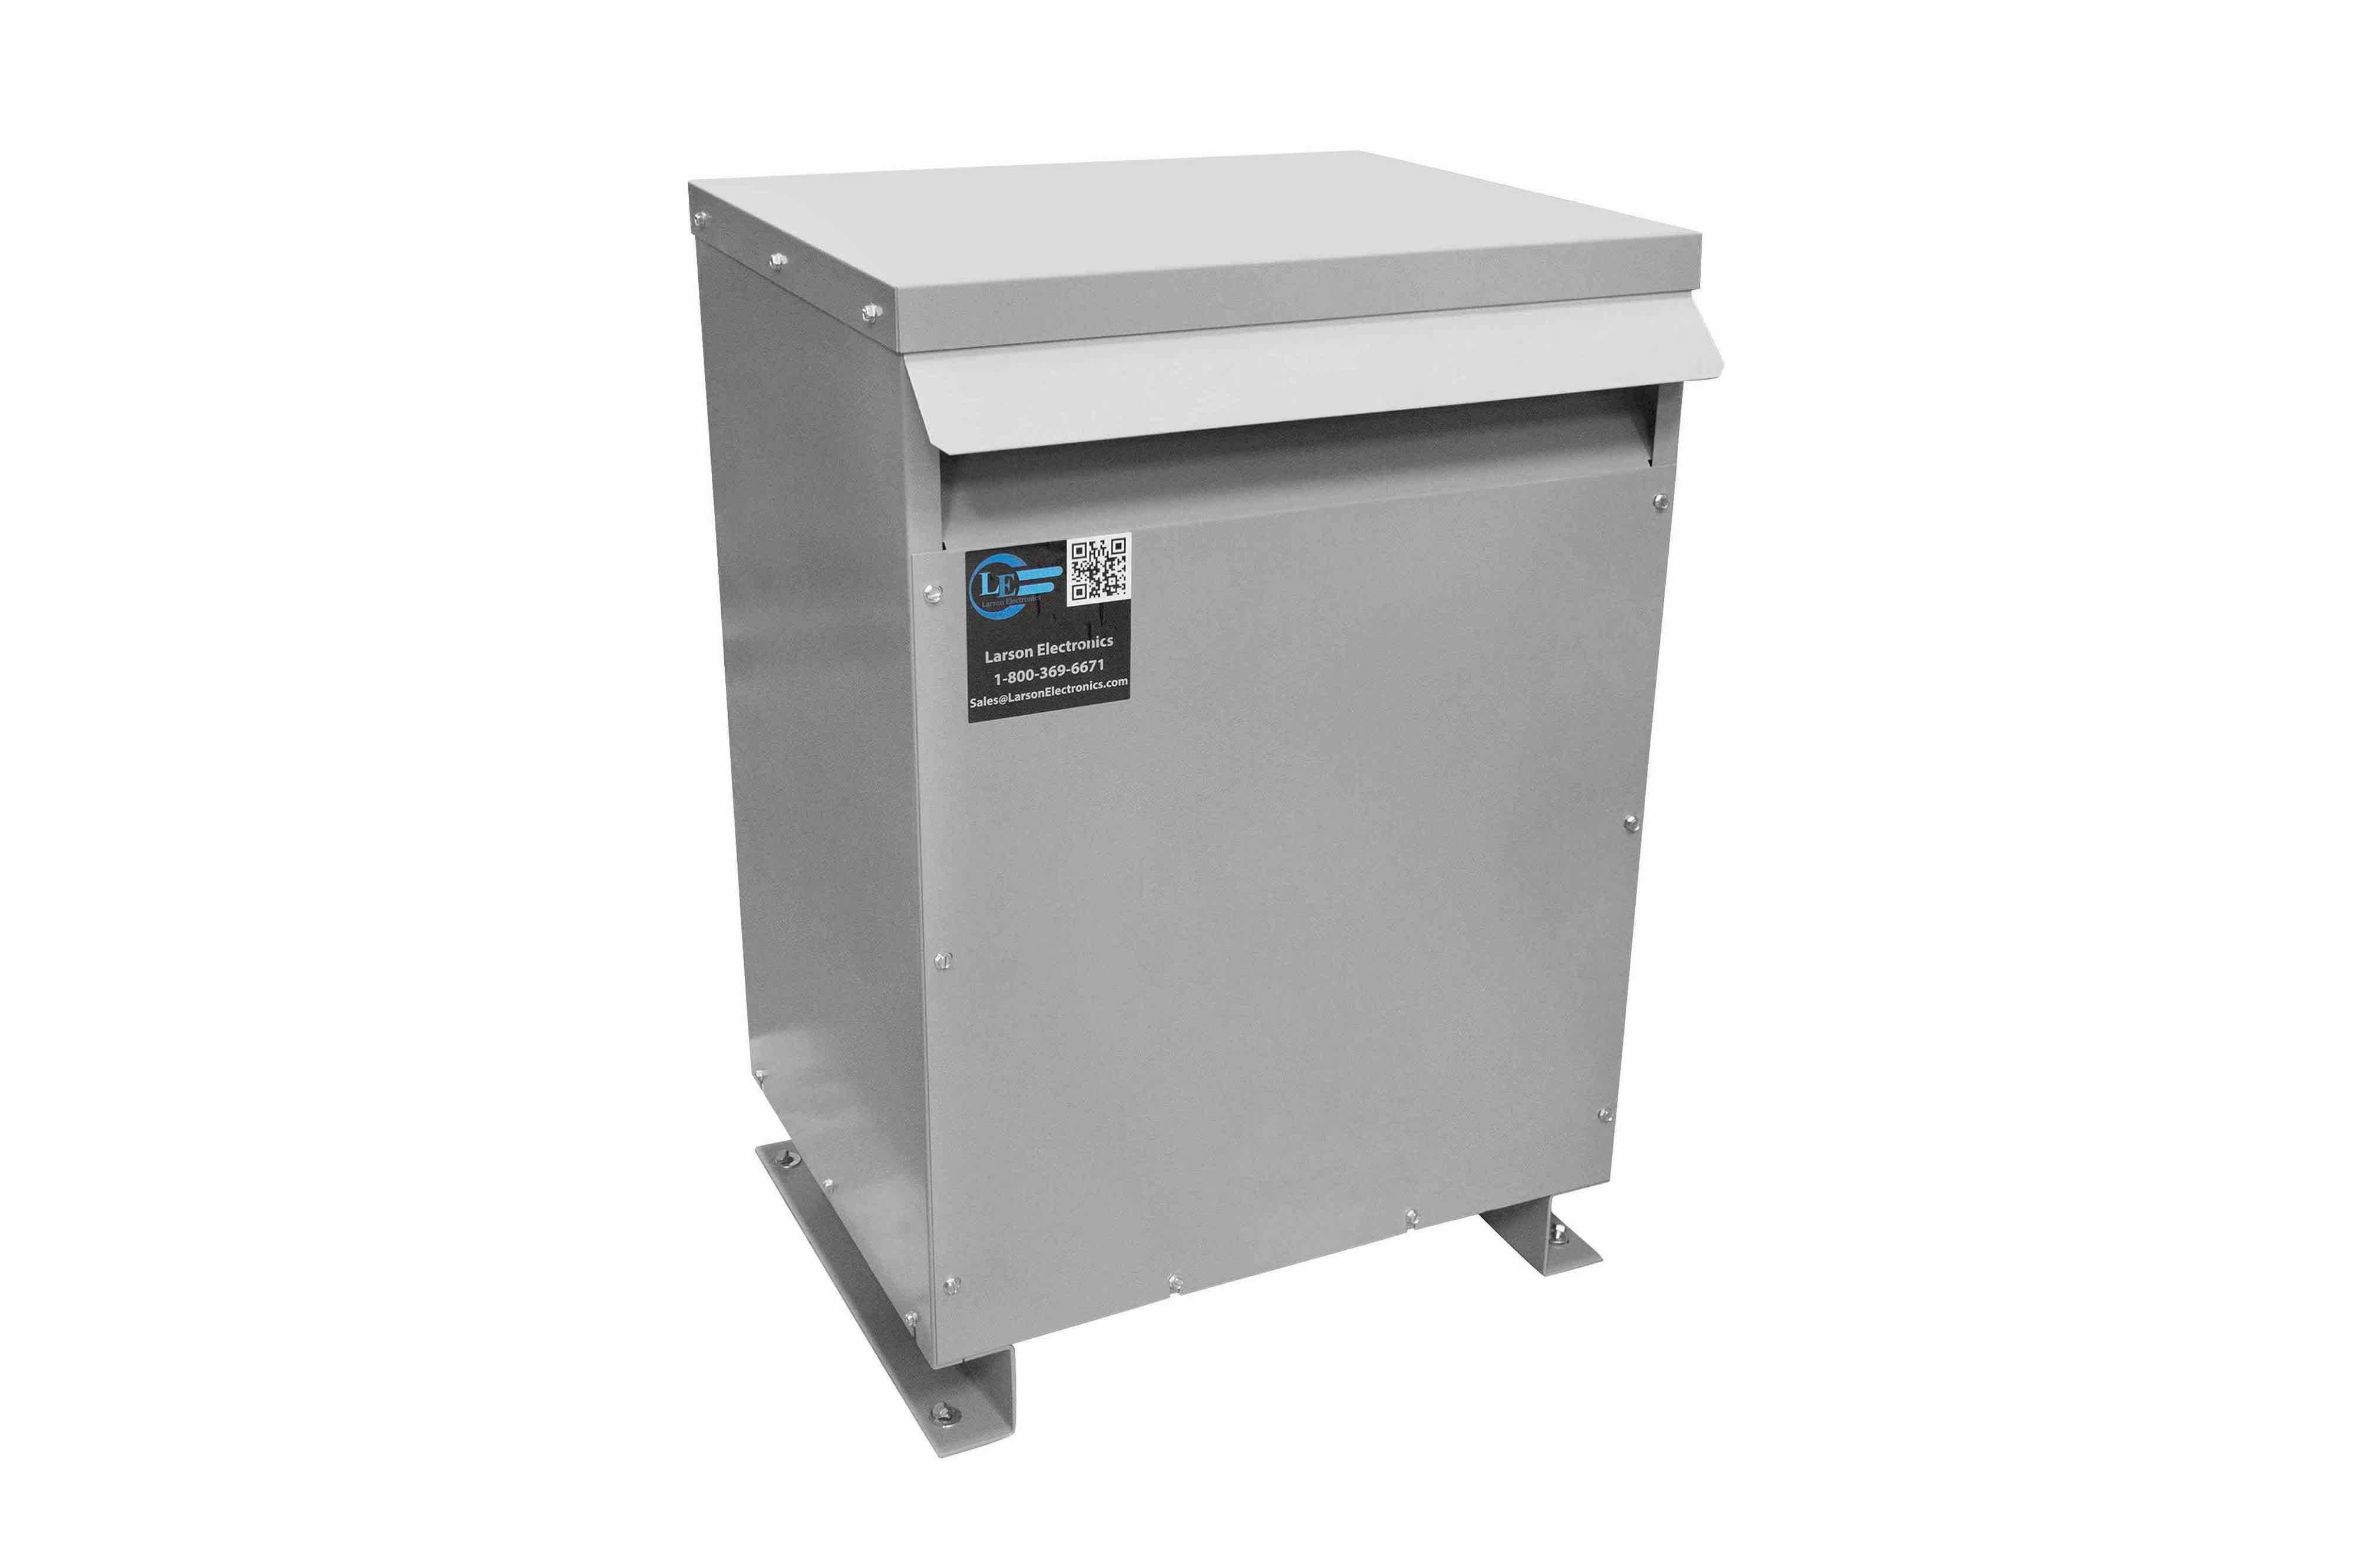 225 kVA 3PH DOE Transformer, 240V Delta Primary, 600Y/347 Wye-N Secondary, N3R, Ventilated, 60 Hz